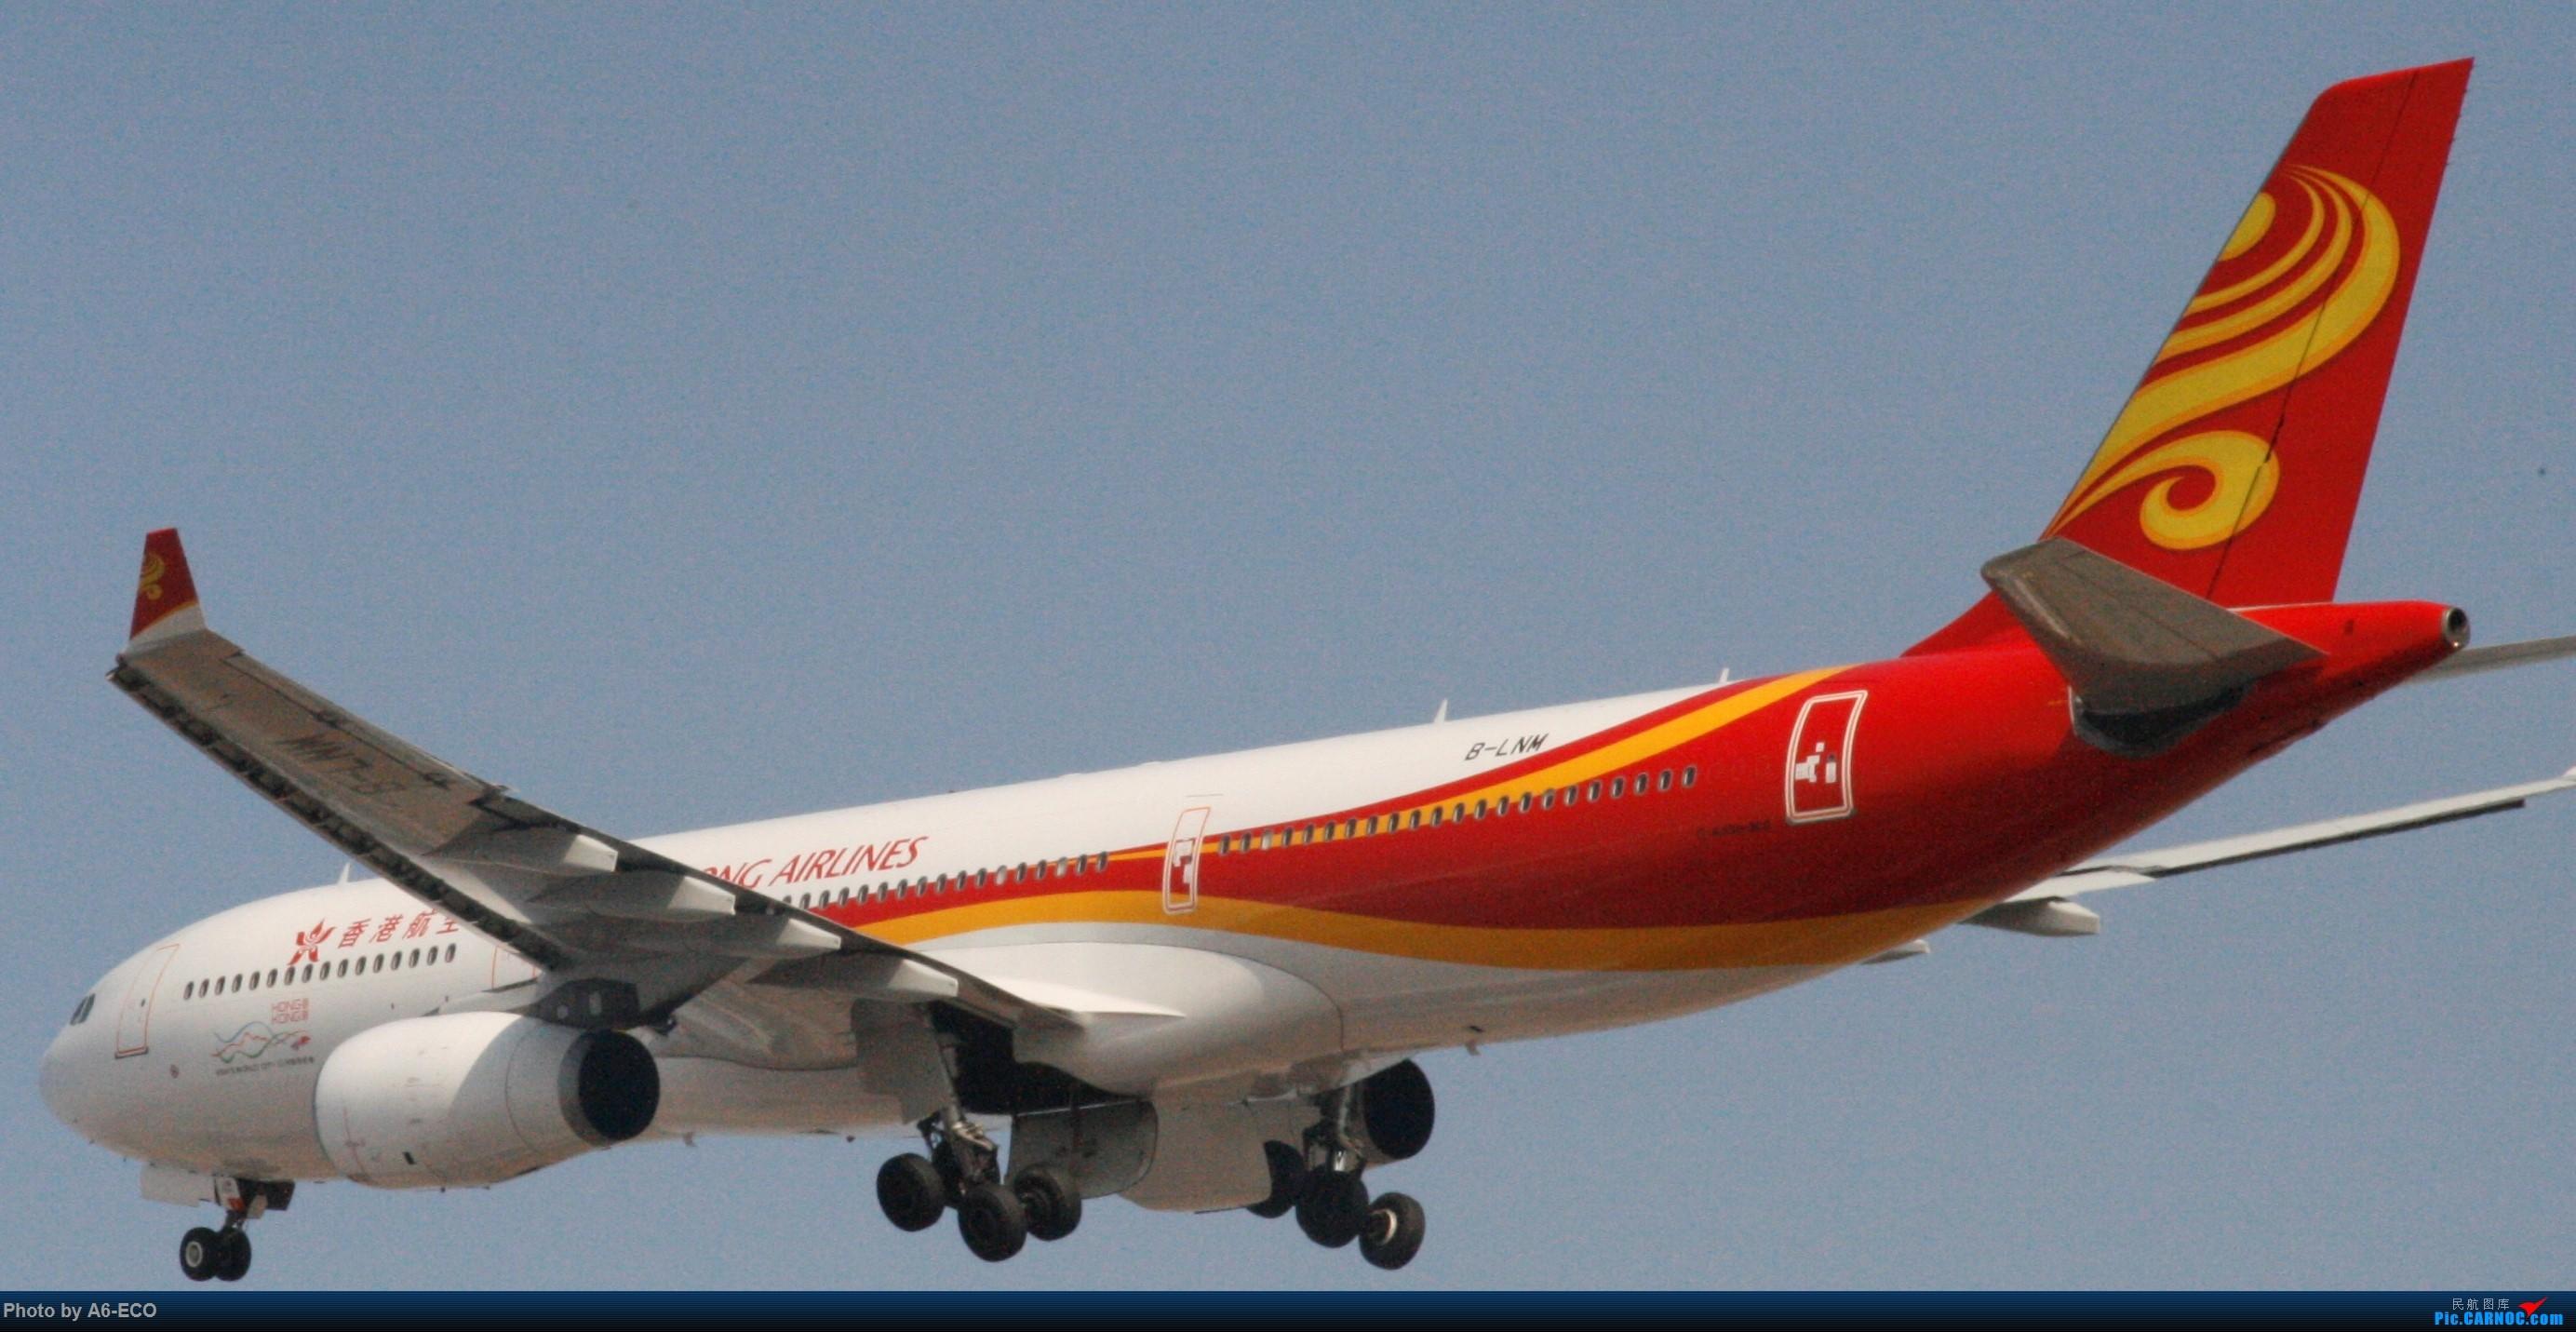 Re:[原创]今天运气极好,云南孔雀,B-1070,2个菜航邮戳,泡菜航彩绘,东航邮戳...... AIRBUS A330-300 B-LNM 中国北京首都国际机场